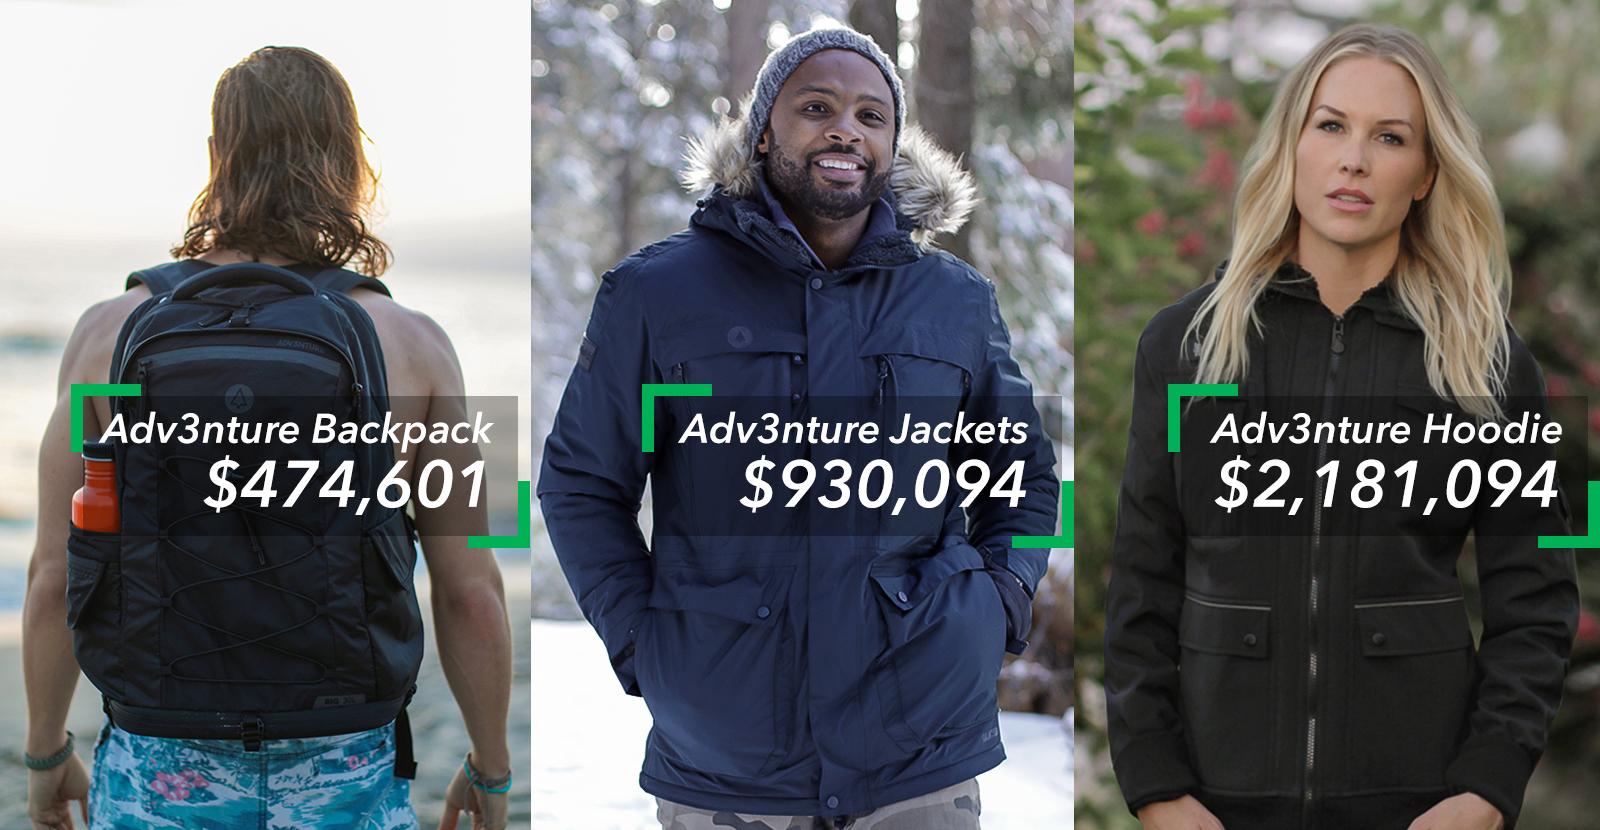 adv3nture clothing adventure clothing company